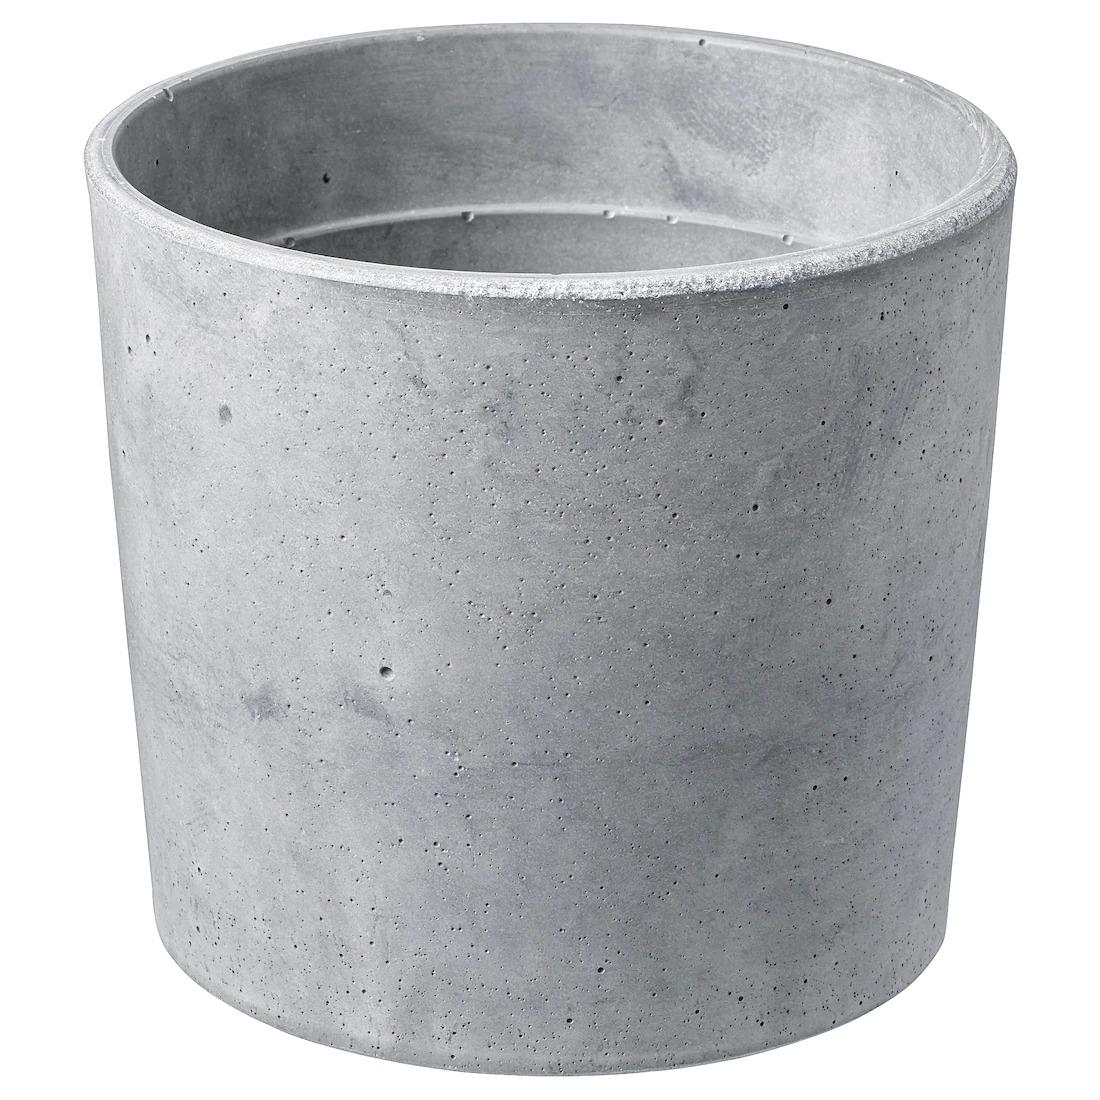 BOYSENBÄR Macetero, int/ext gris claro, 12 cm 4€